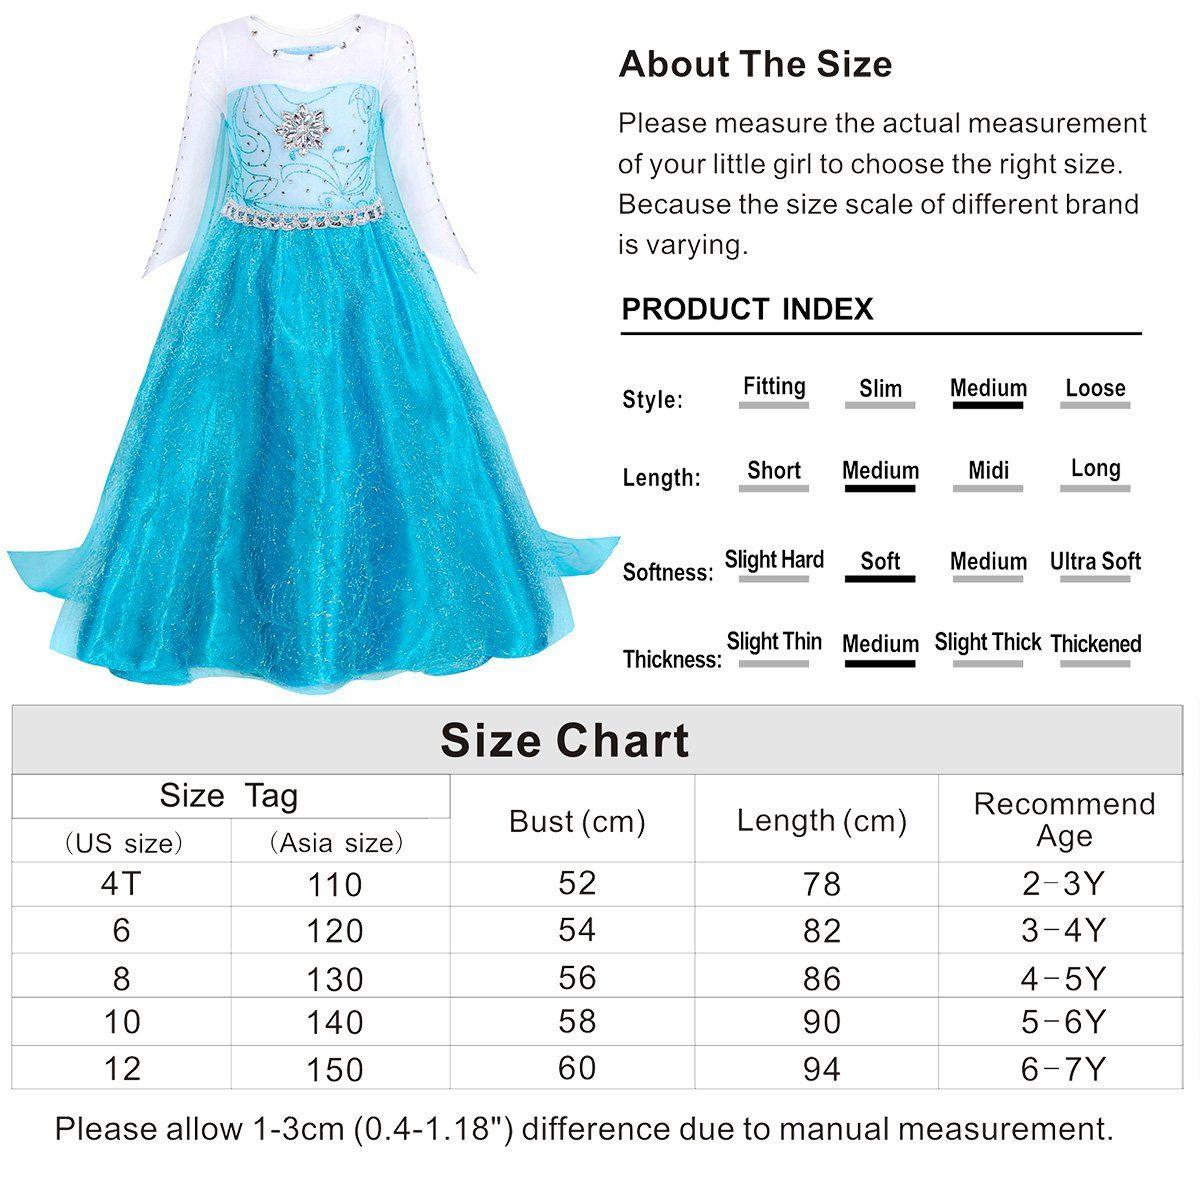 bace89f6c3cb Cotrio Princess Elsa Costume Dress Up Toddler Halloween Costumes ...